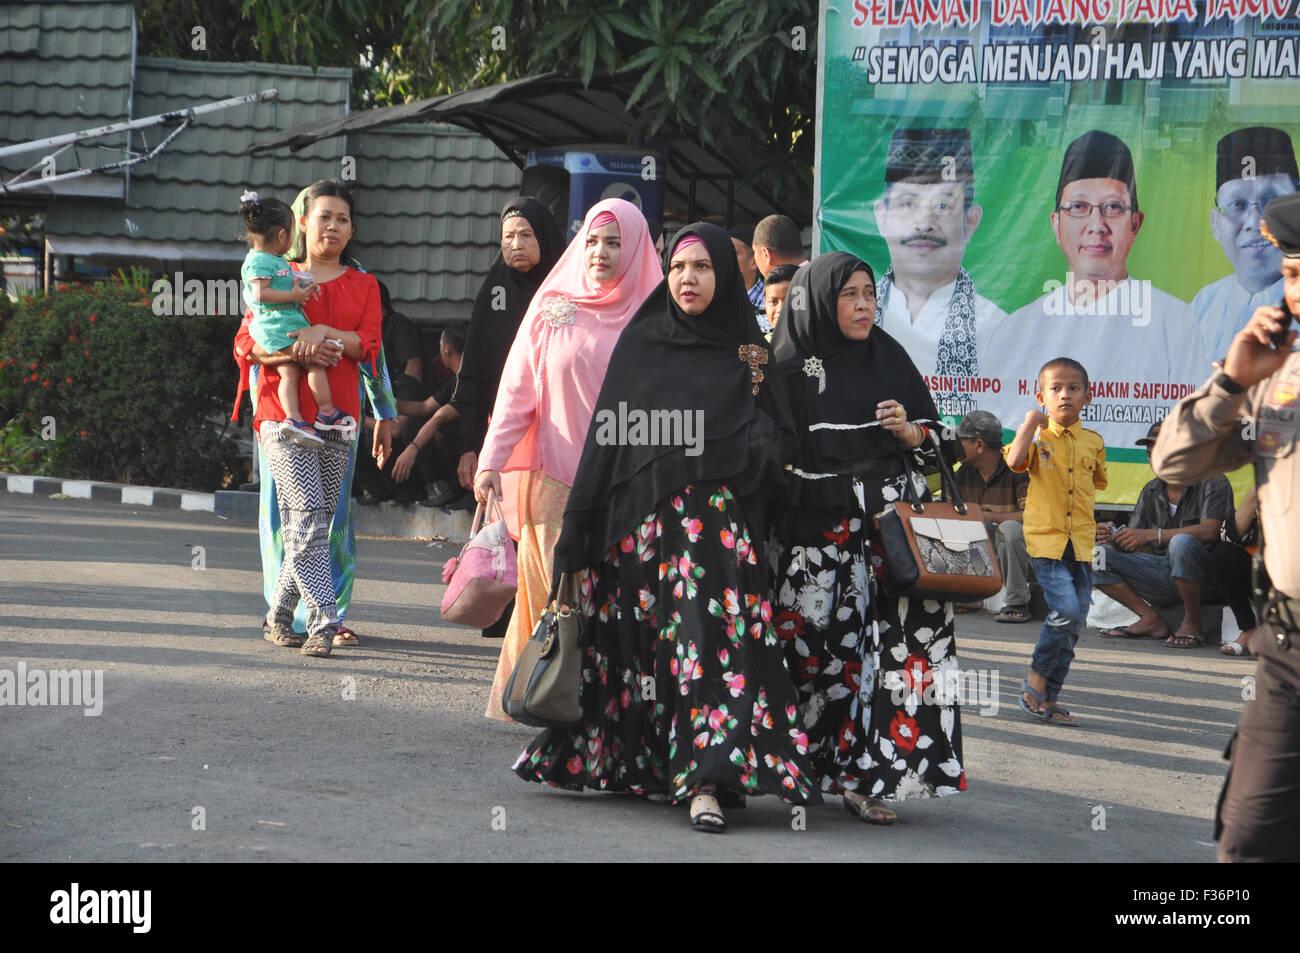 Makassar, Indonesia. 30th September, 2015. An Indonesian family walk at Sudiang Hajj Hostel Complex in Makassar, - Stock Image